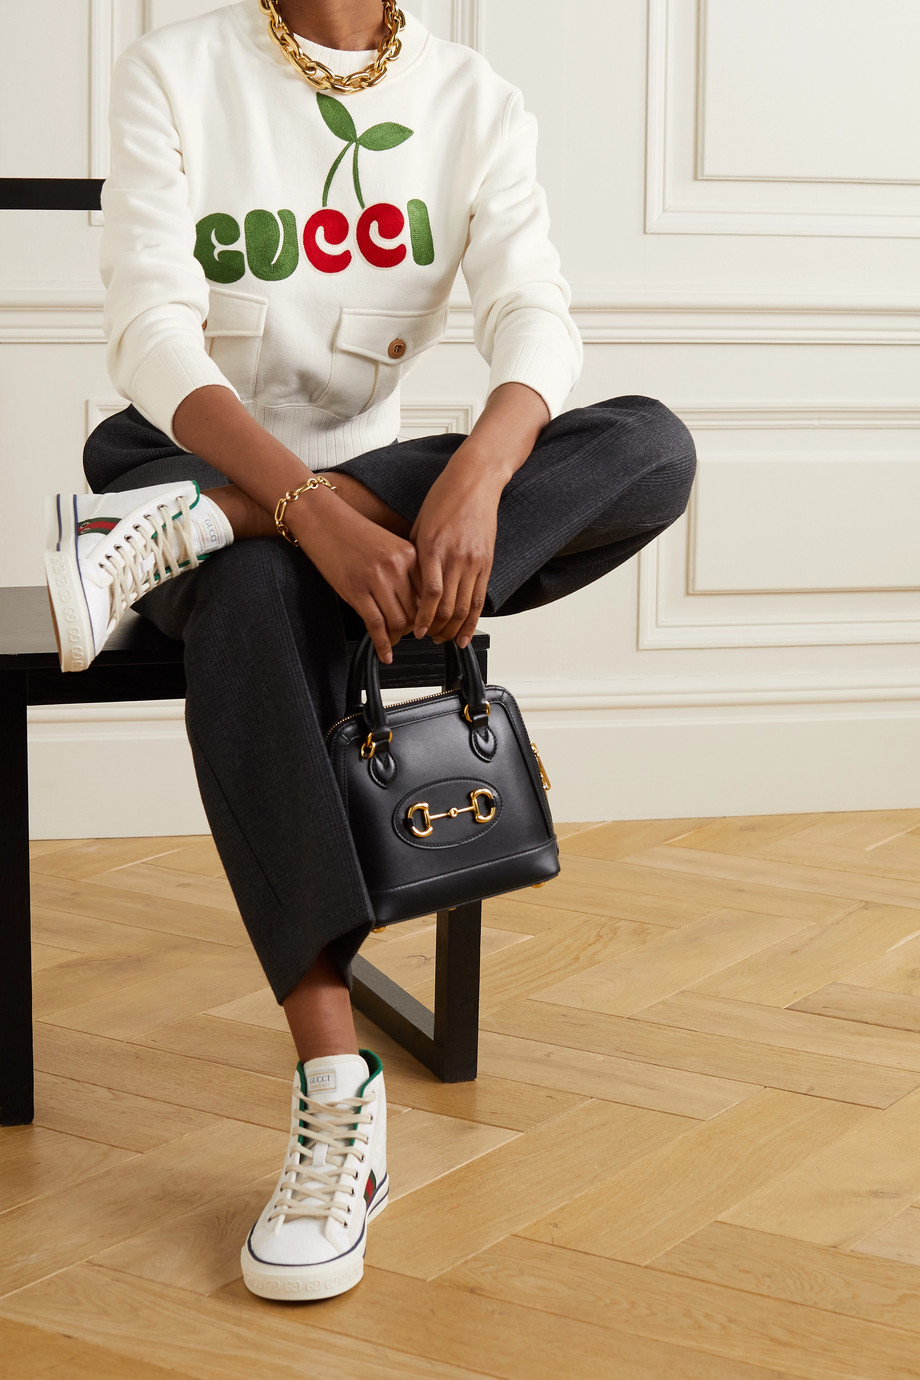 Gucci + NET SUSTAIN embroidered organic cotton-jersey sweatshirt